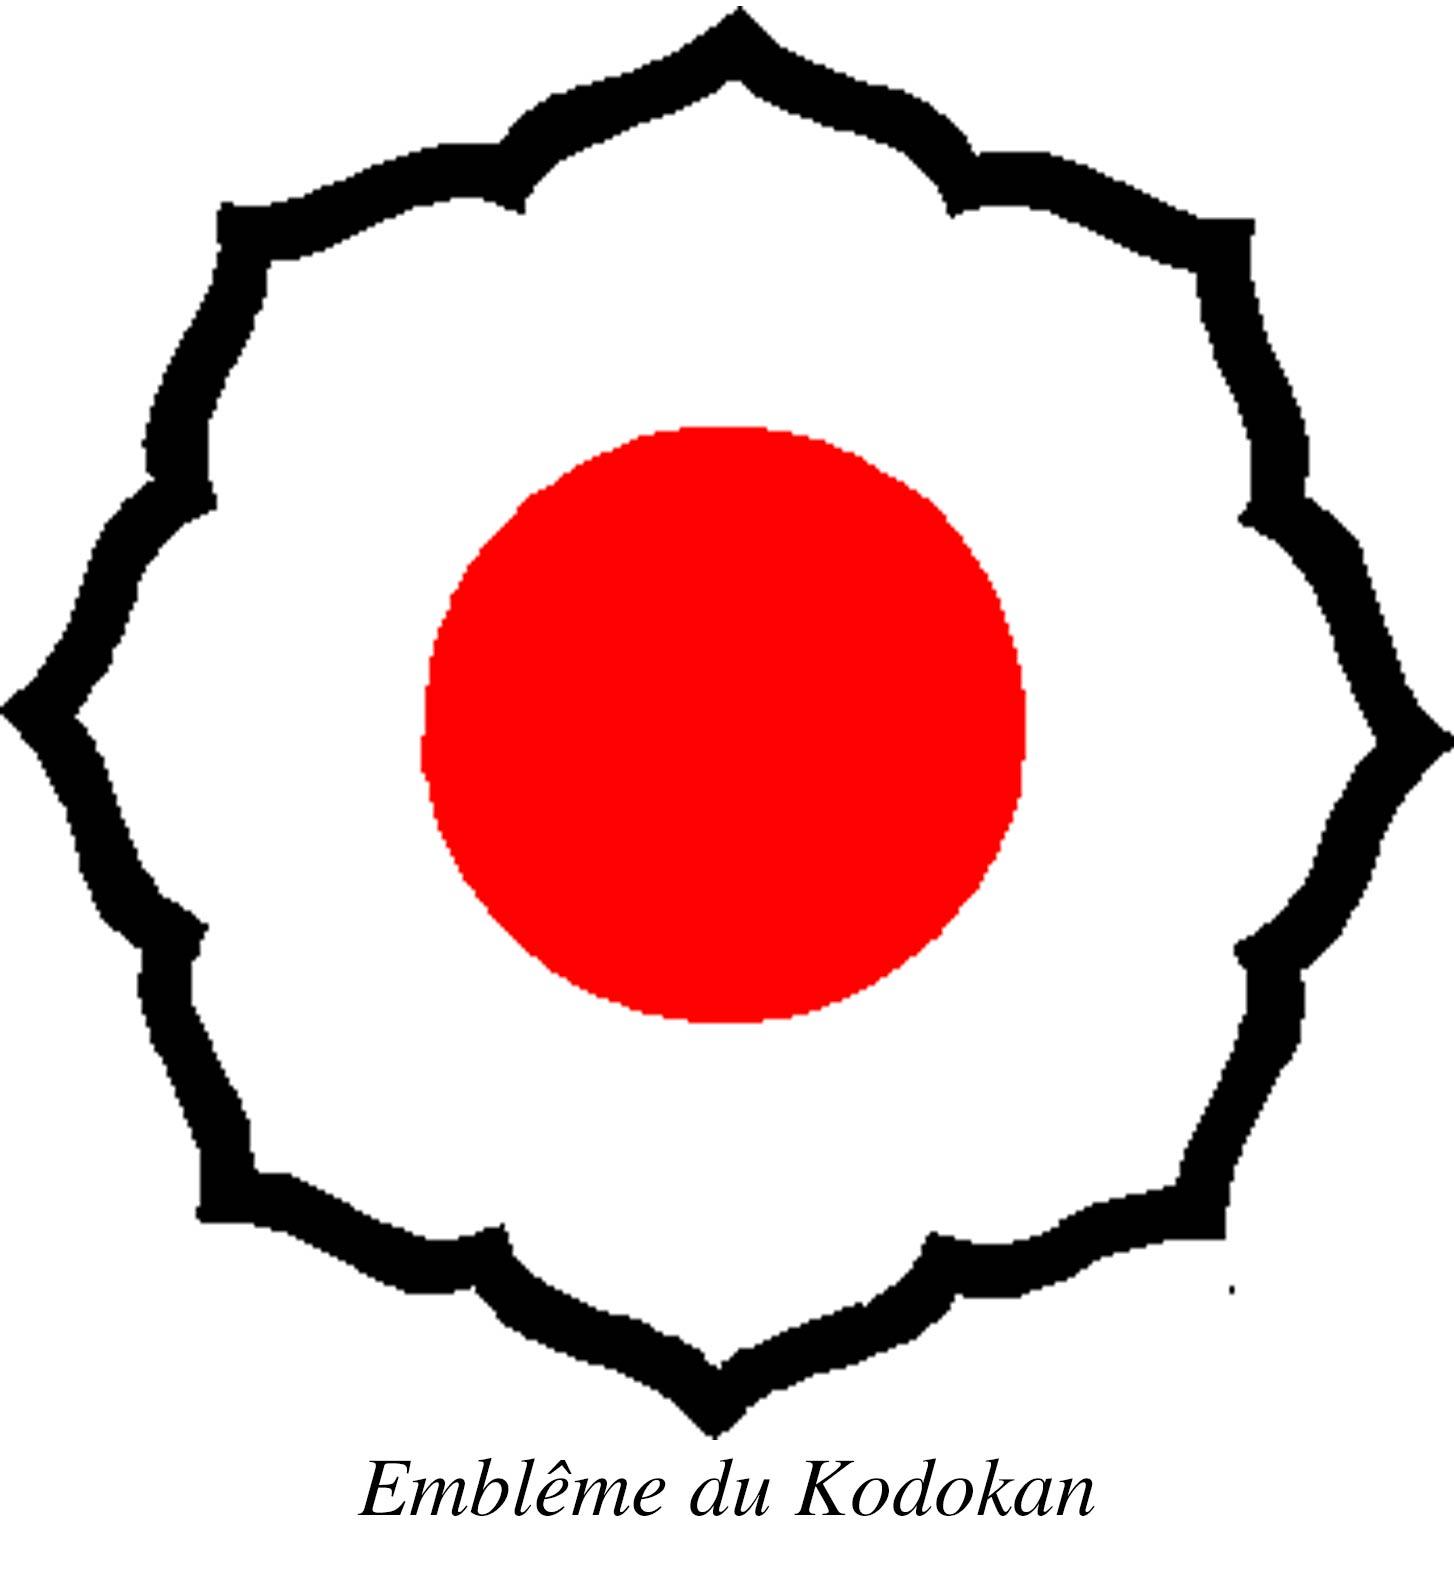 Embleme kodokan web